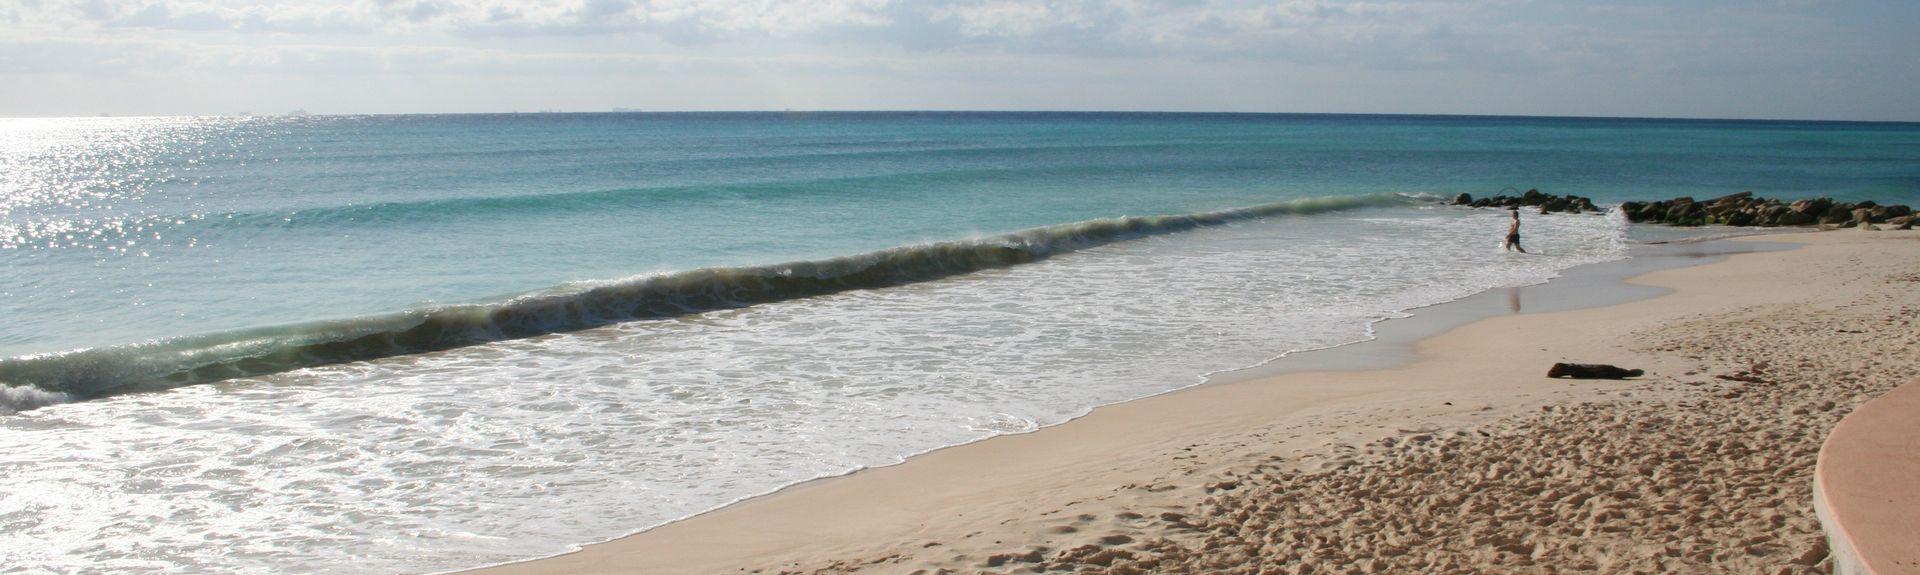 Xaman Ha, Playacar, Playa del Carmen, Q.R., Mexico